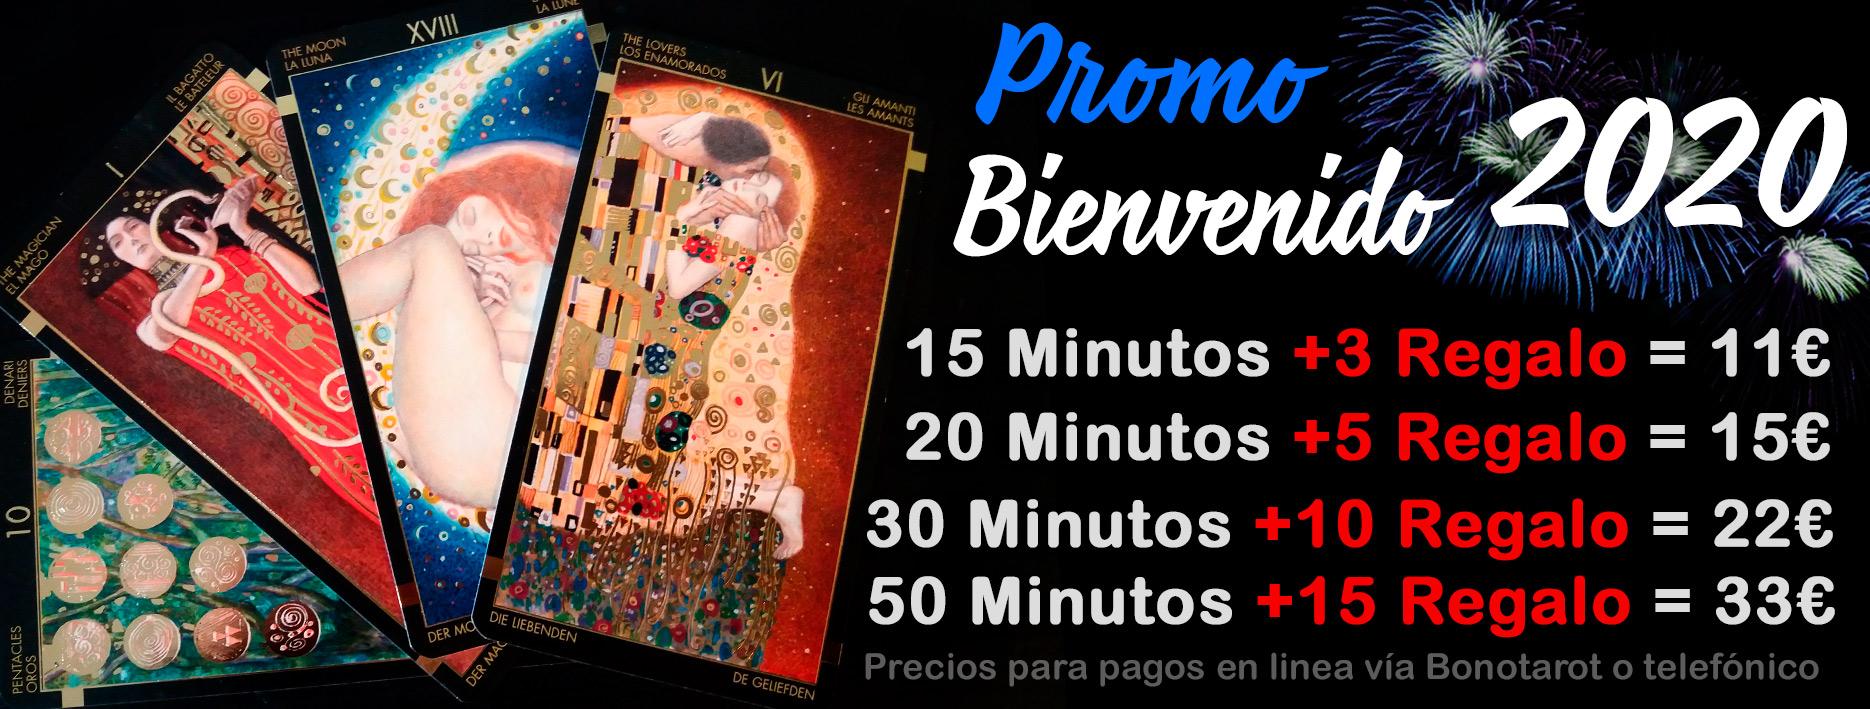 promo tarot economico ofertas tarot barato tarot visa eeuu minutos regalo gratis mexico